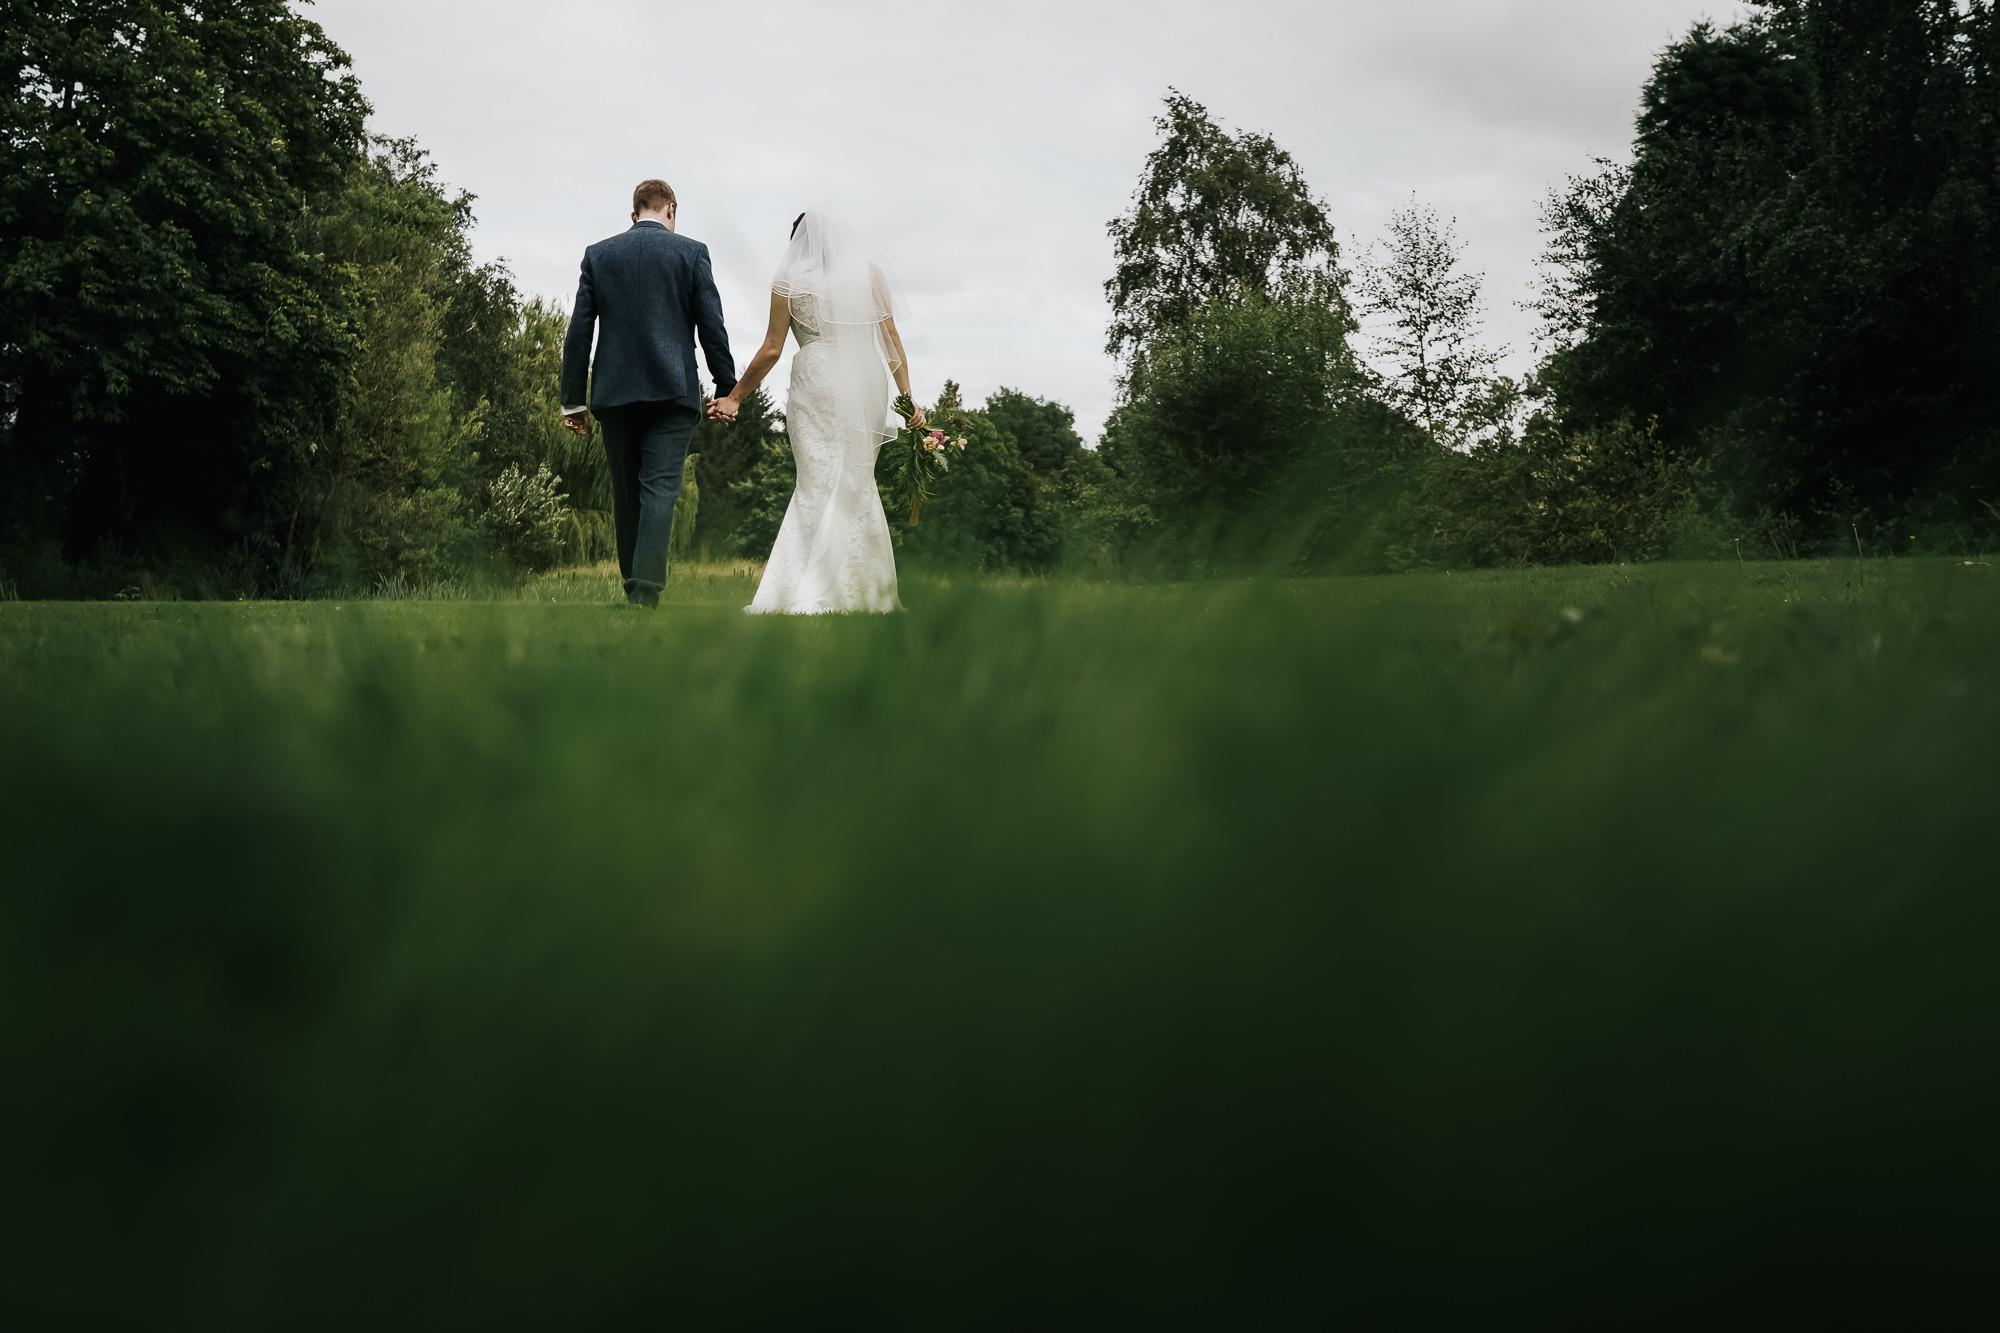 Oak tree of peover wedding photography cheshire wedding photographer (38 of 56).jpg